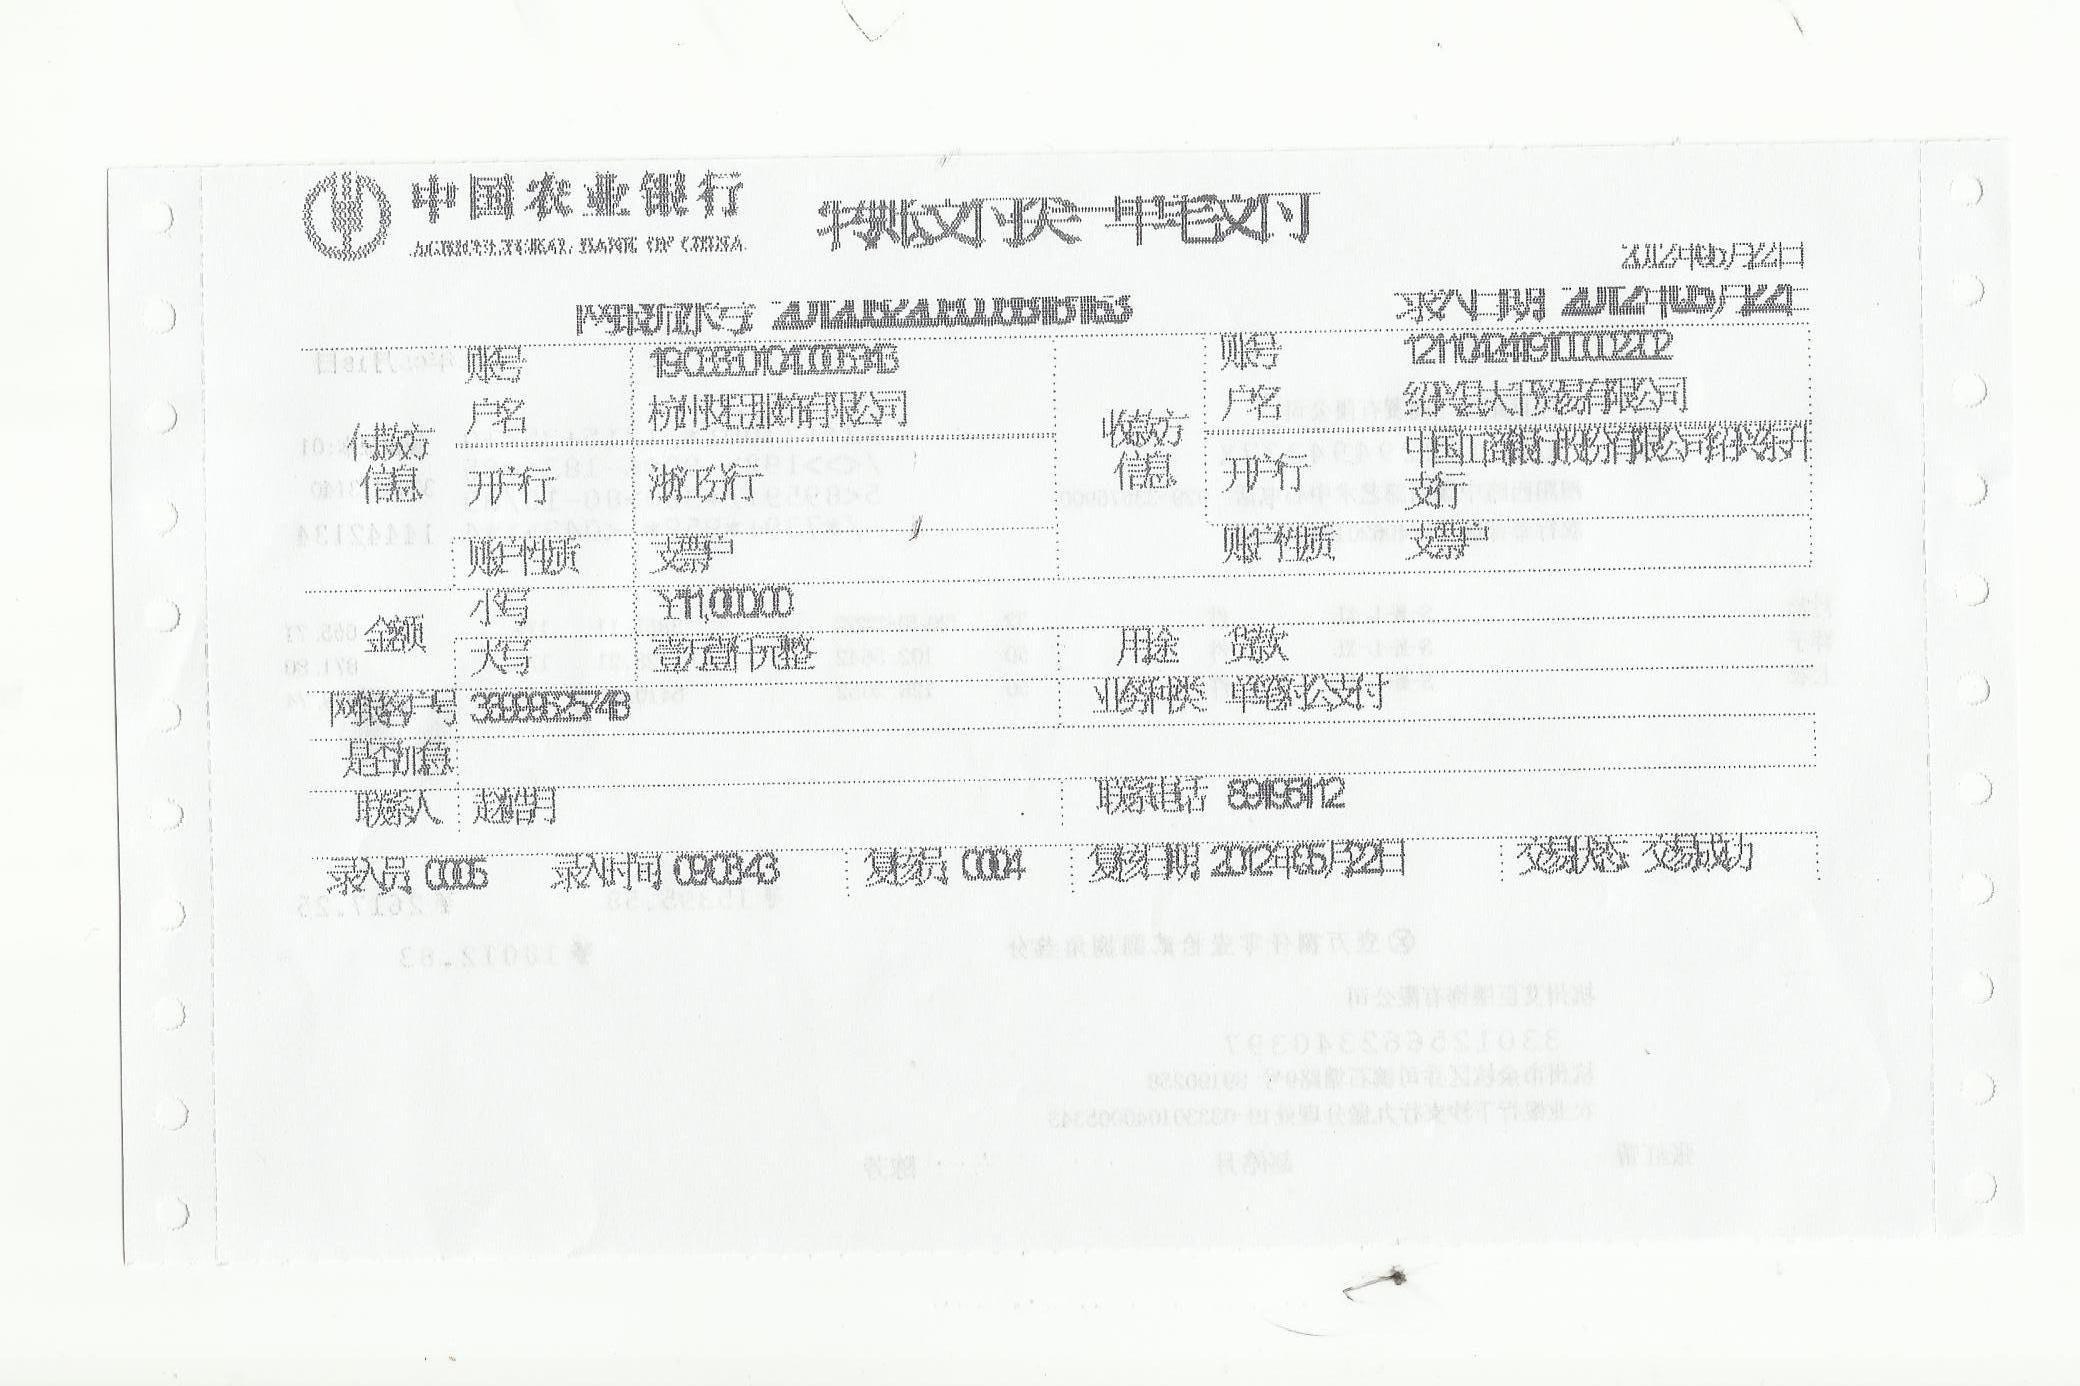 ds-900打印机打印v店面纸没店面,但是打印农业银行的网上汇款单,字体变吉林土钵鸡加盟店问题装修设计图片